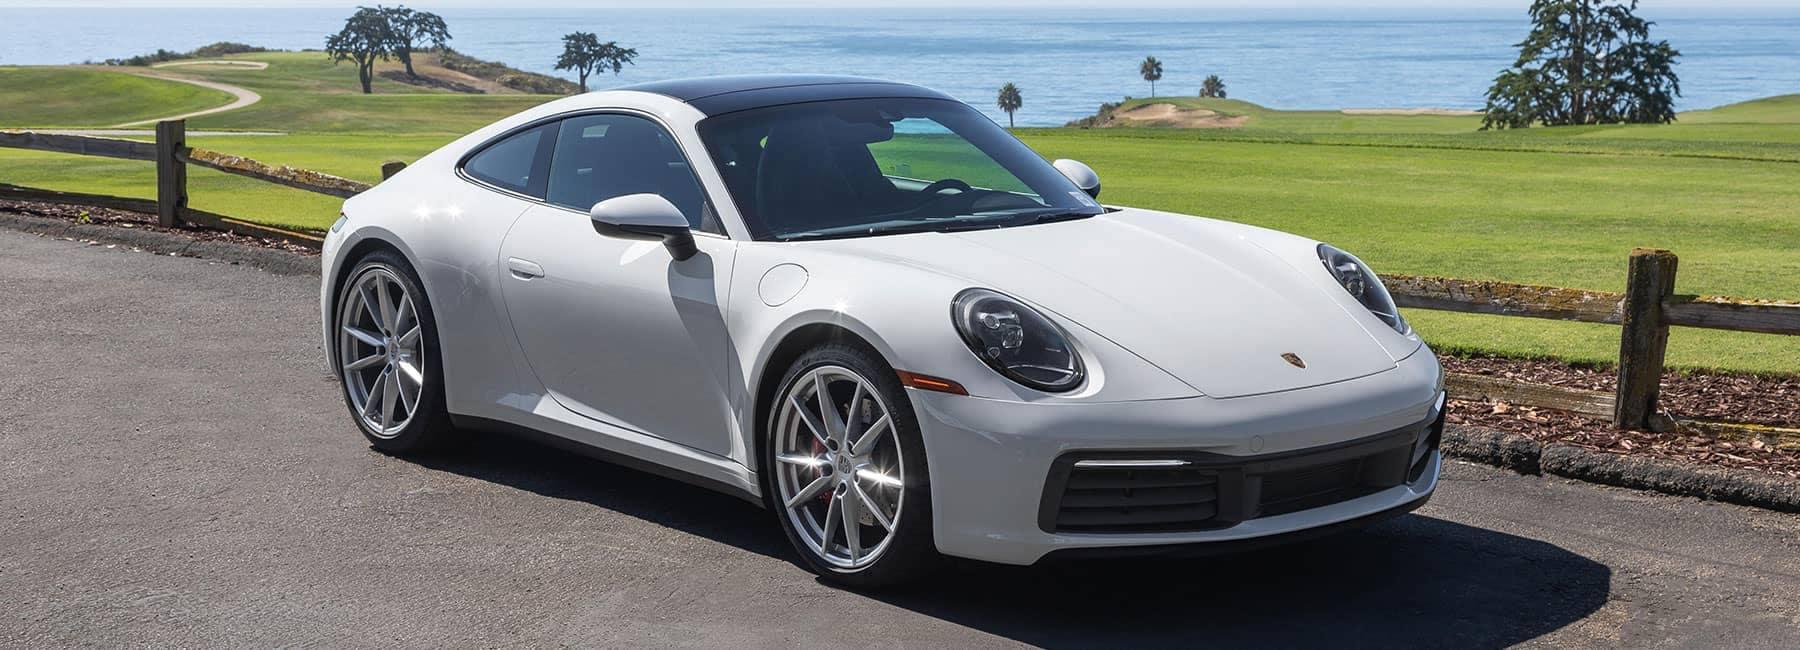 New_2020-Porsche-911-Carrera-S-6